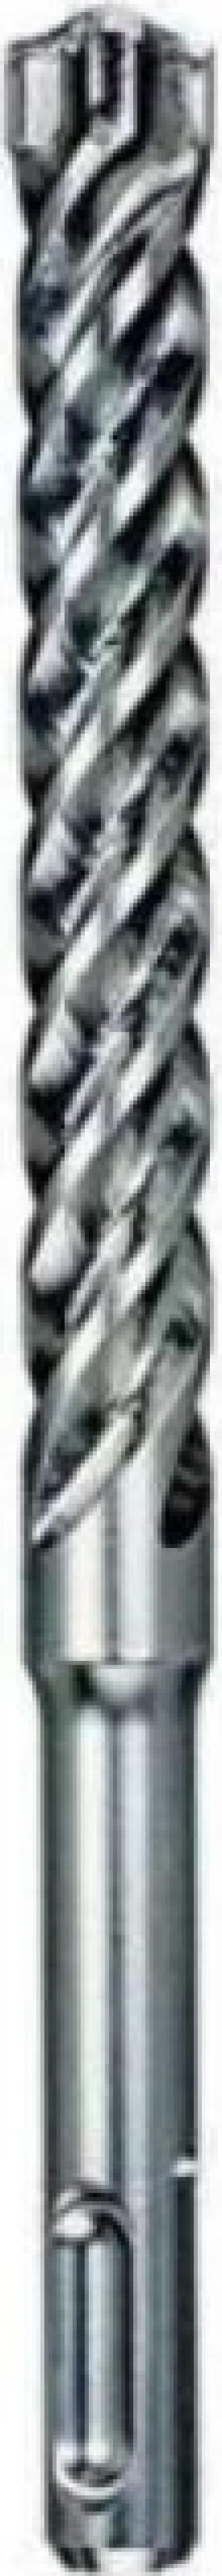 Burghiu Dewalt XLR SDS-plus 5 x 100 x 160 DT8908-QZ Accesorii masini de gaurit